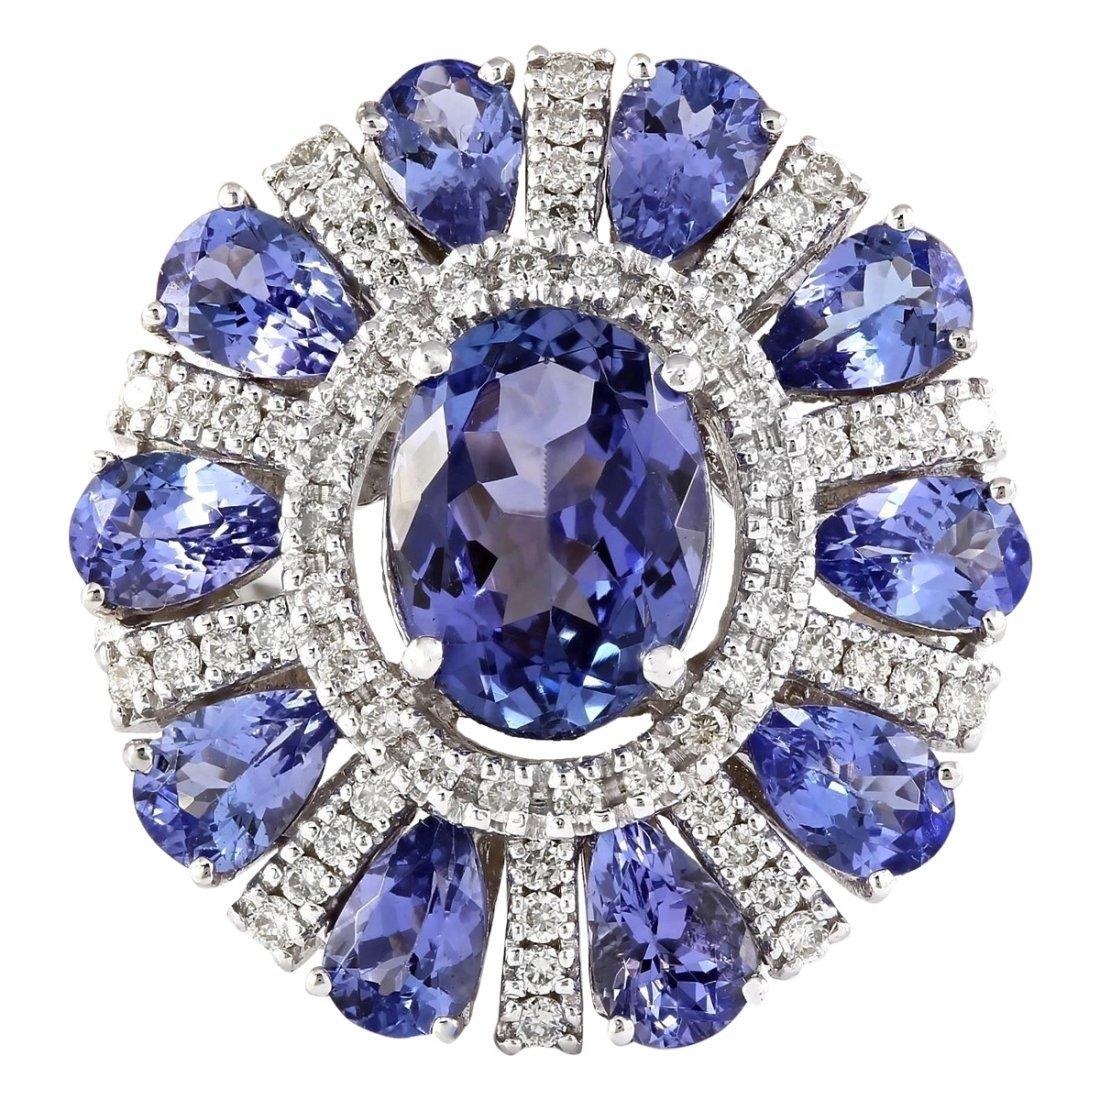 8.41 CTW Natural Tanzanite And Diamond Ring In 14k